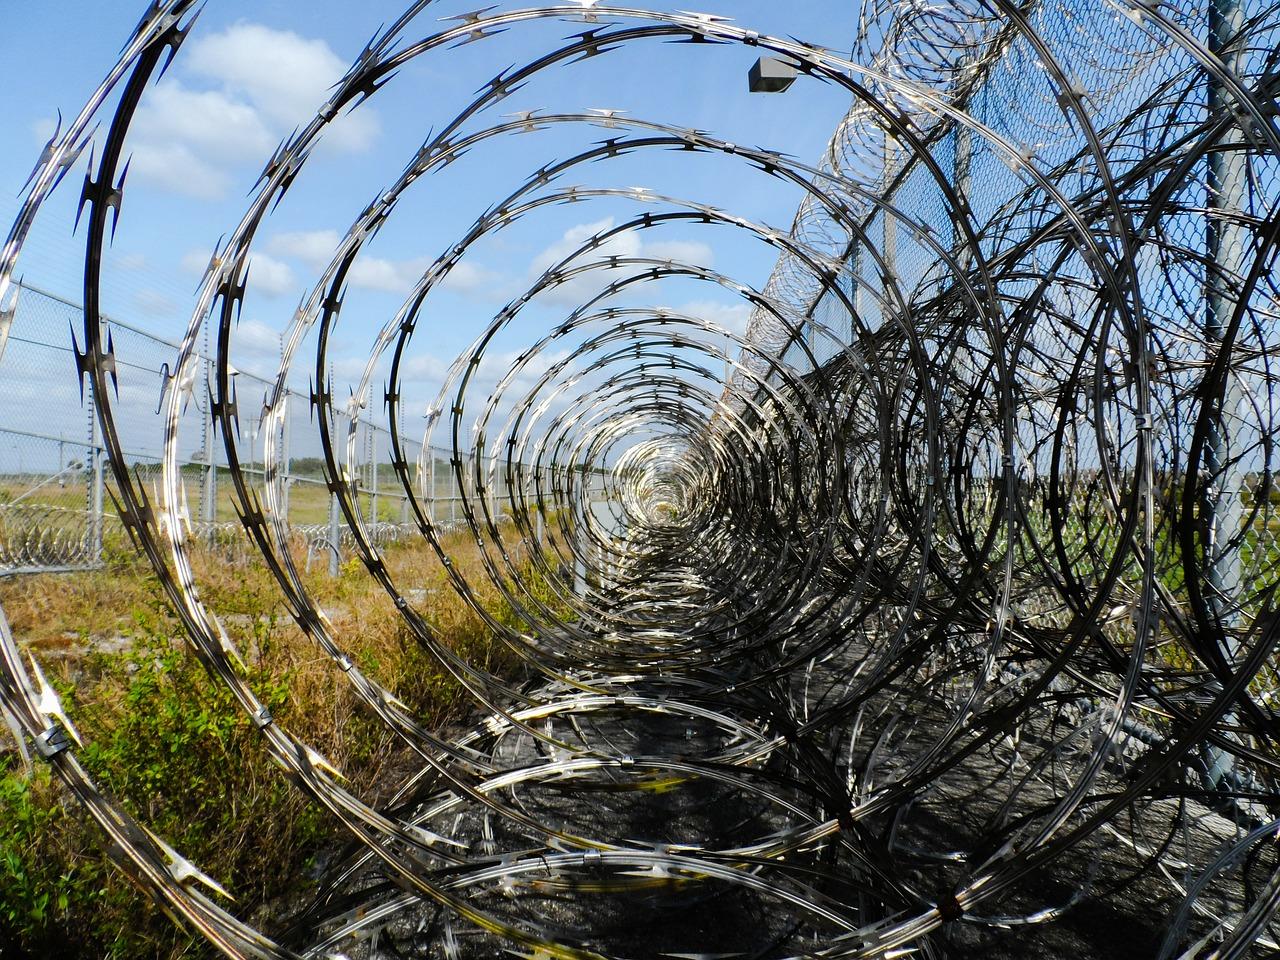 prison-fence-218456_1280